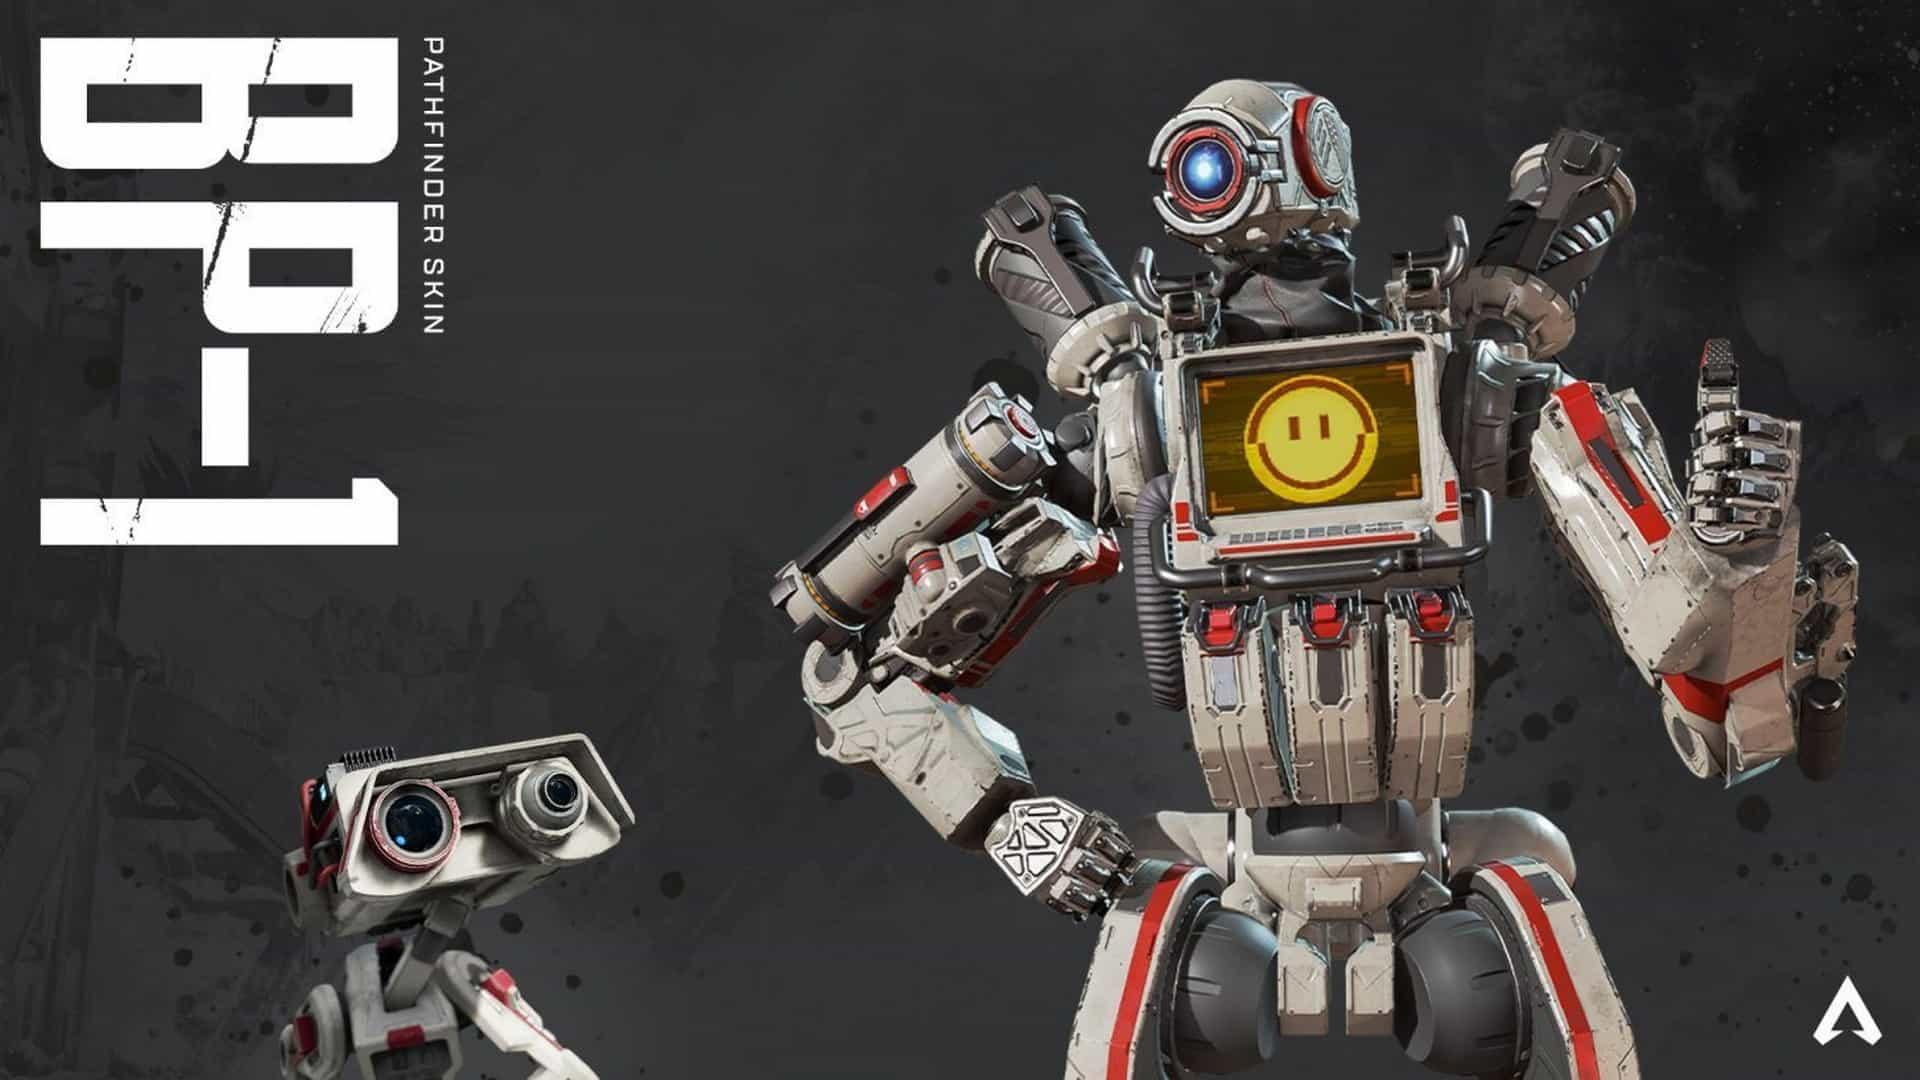 Apex Legends Player Progression Changes, Gun Charms, BD-1 Skin, Merch Shop Now Live